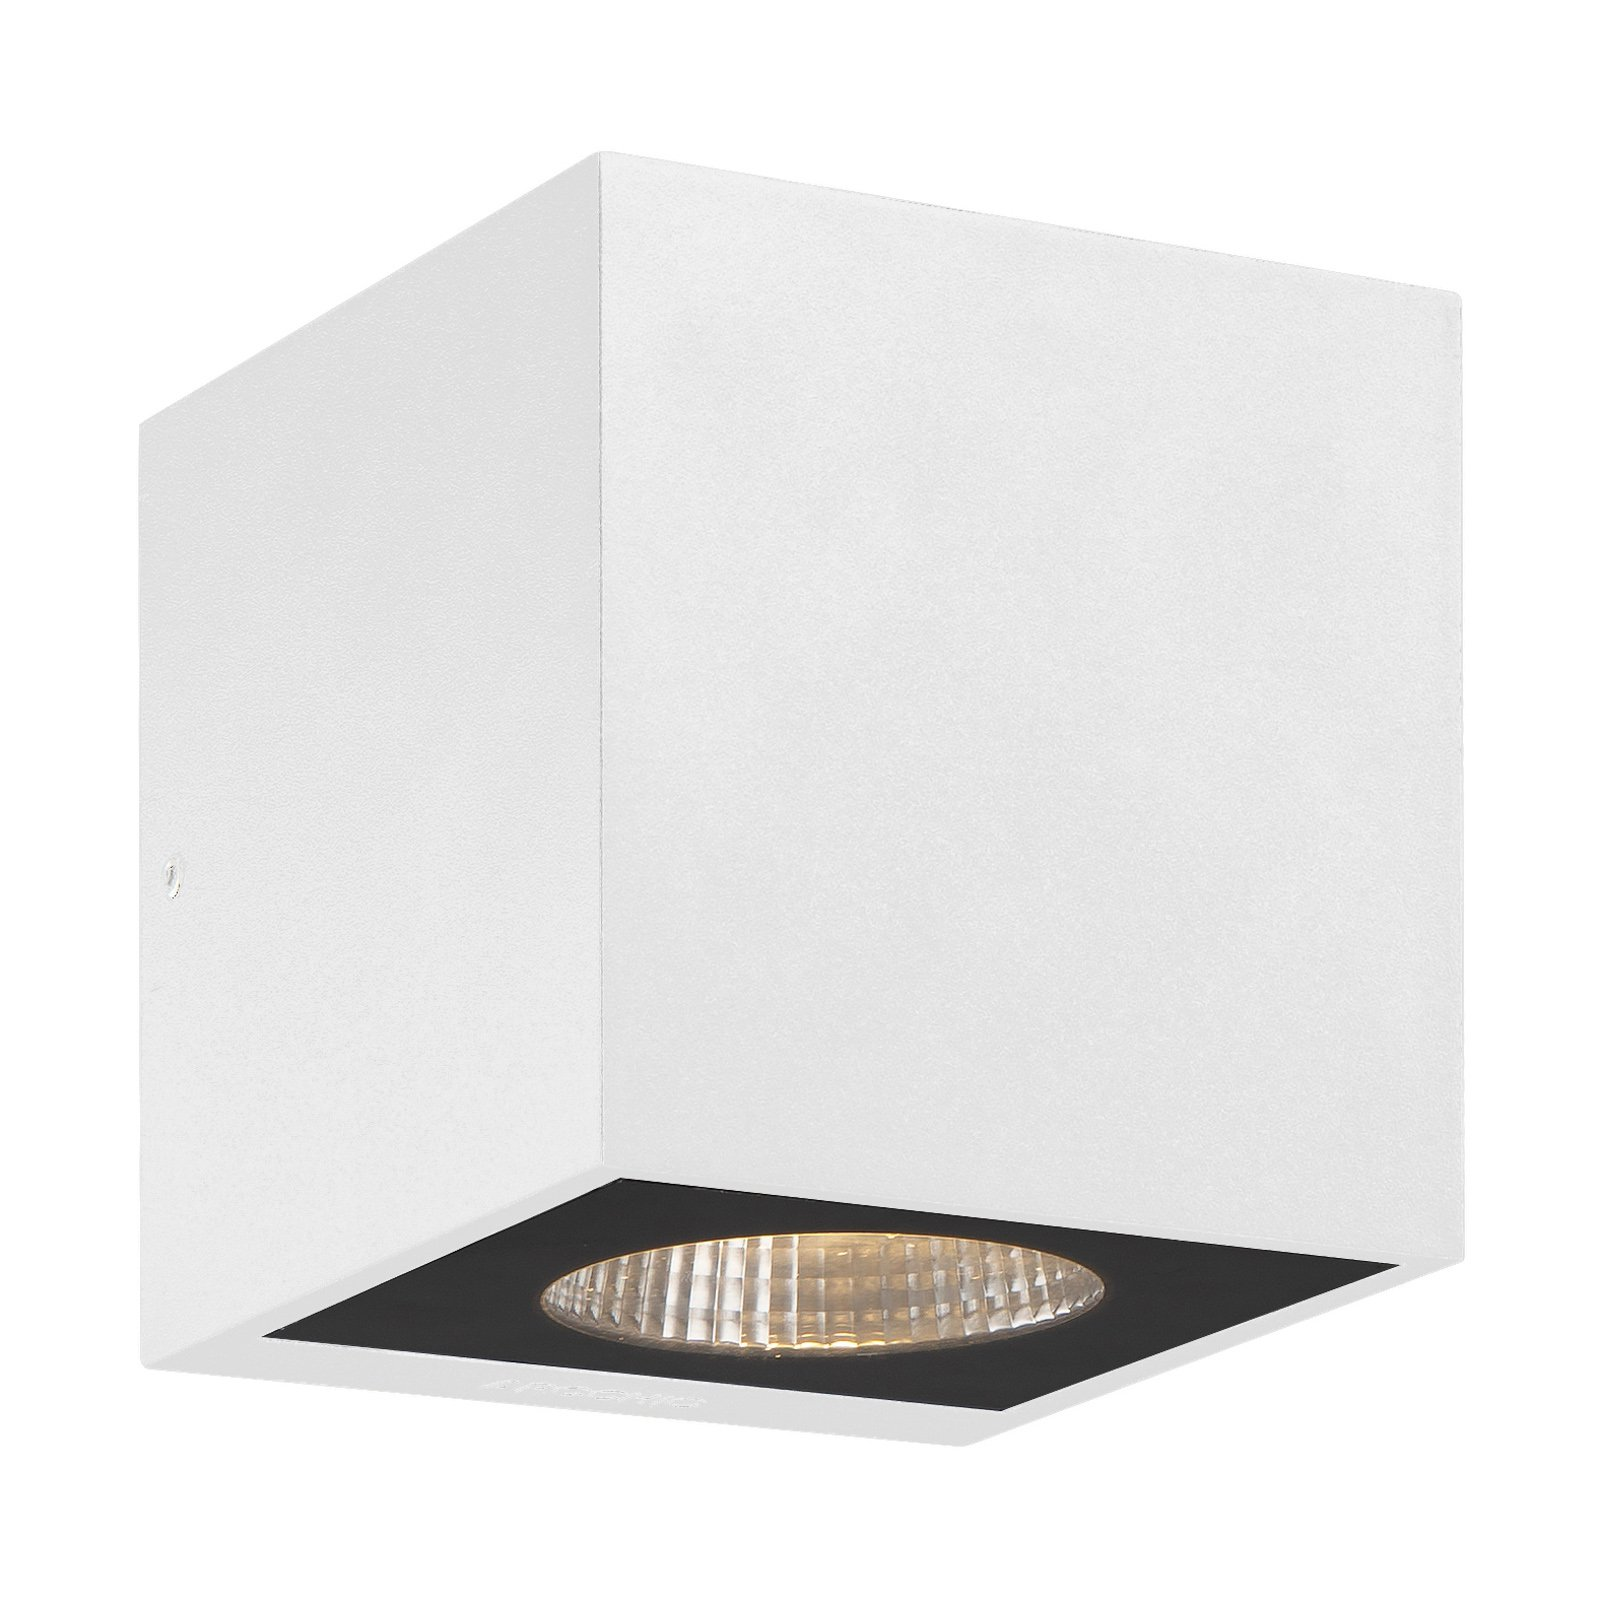 Arcchio Tassnim LED-vegglampe hvit 1 lyskilde